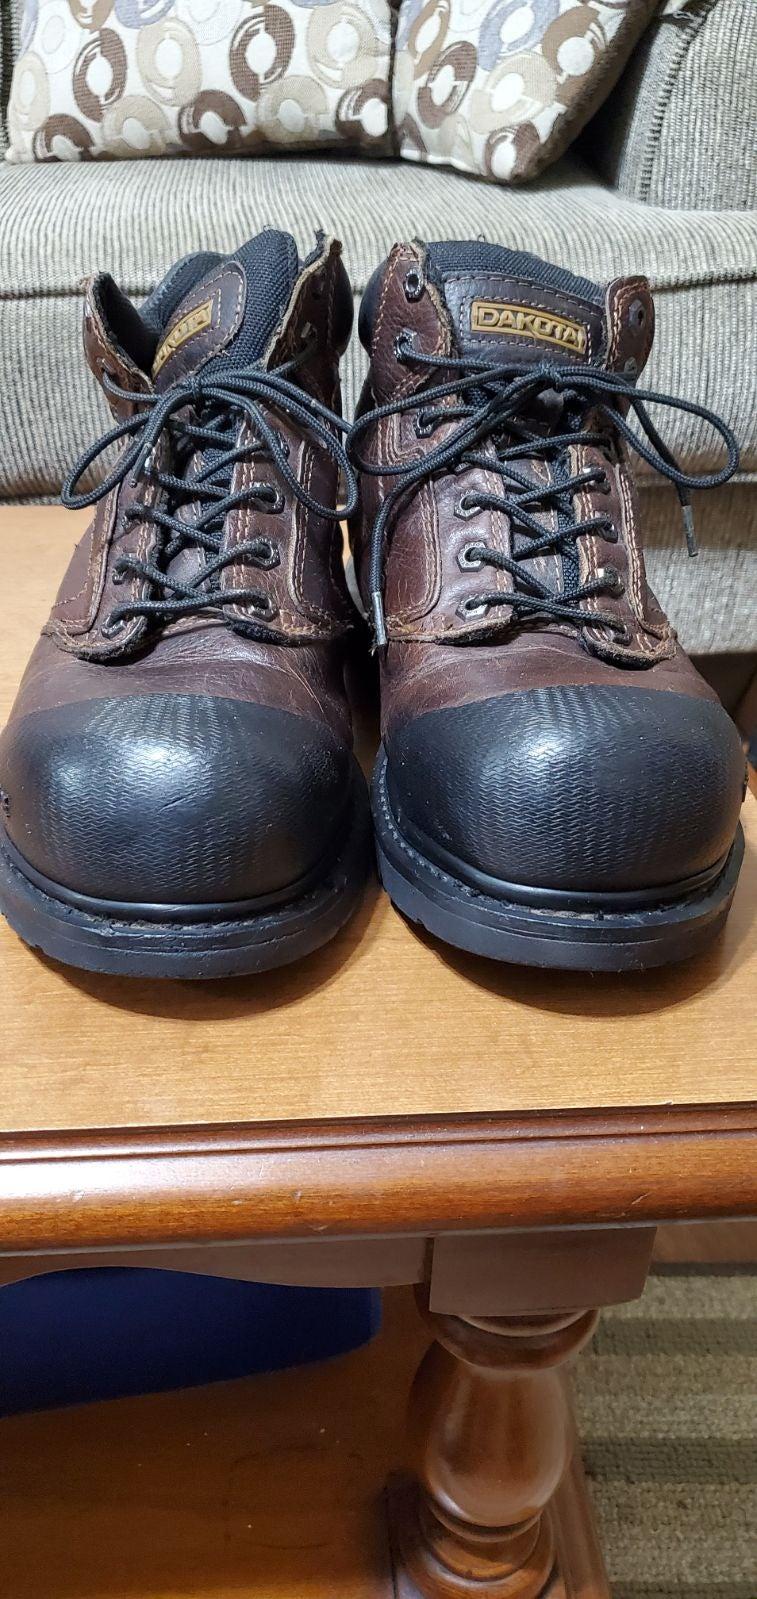 Dakota size 9 steel toe work boots